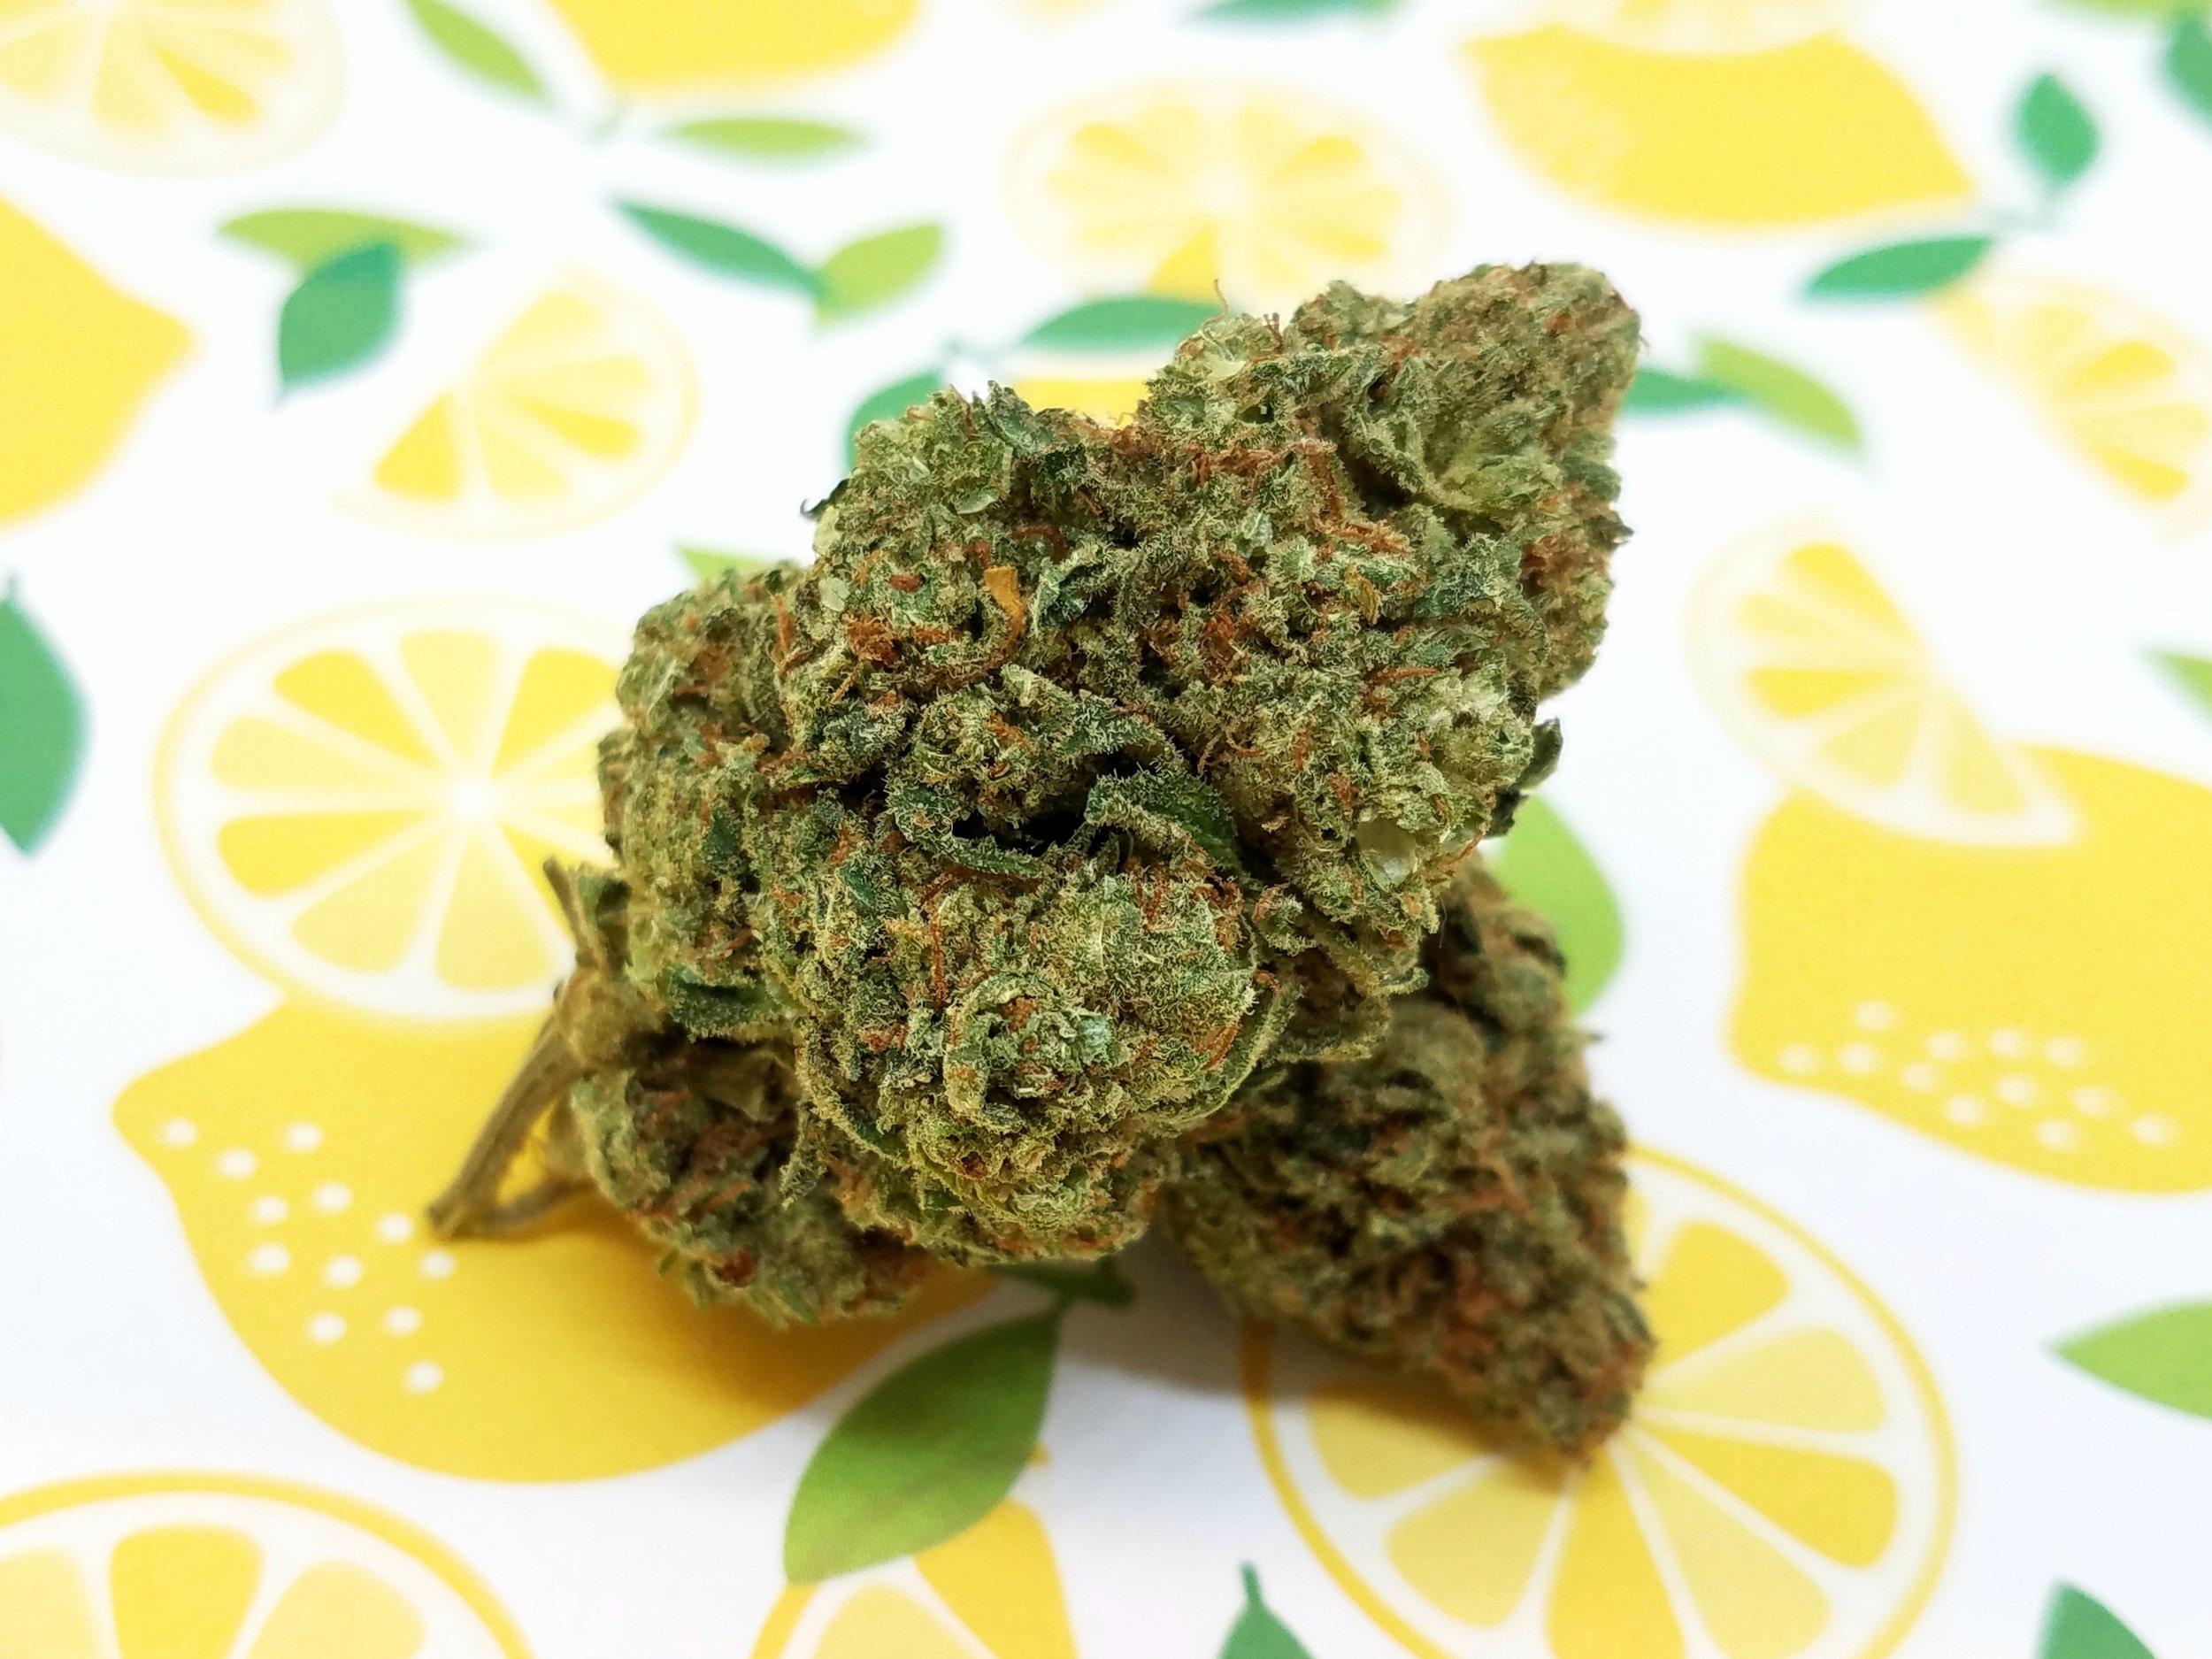 Golden Lemons grown by Renegade Roots